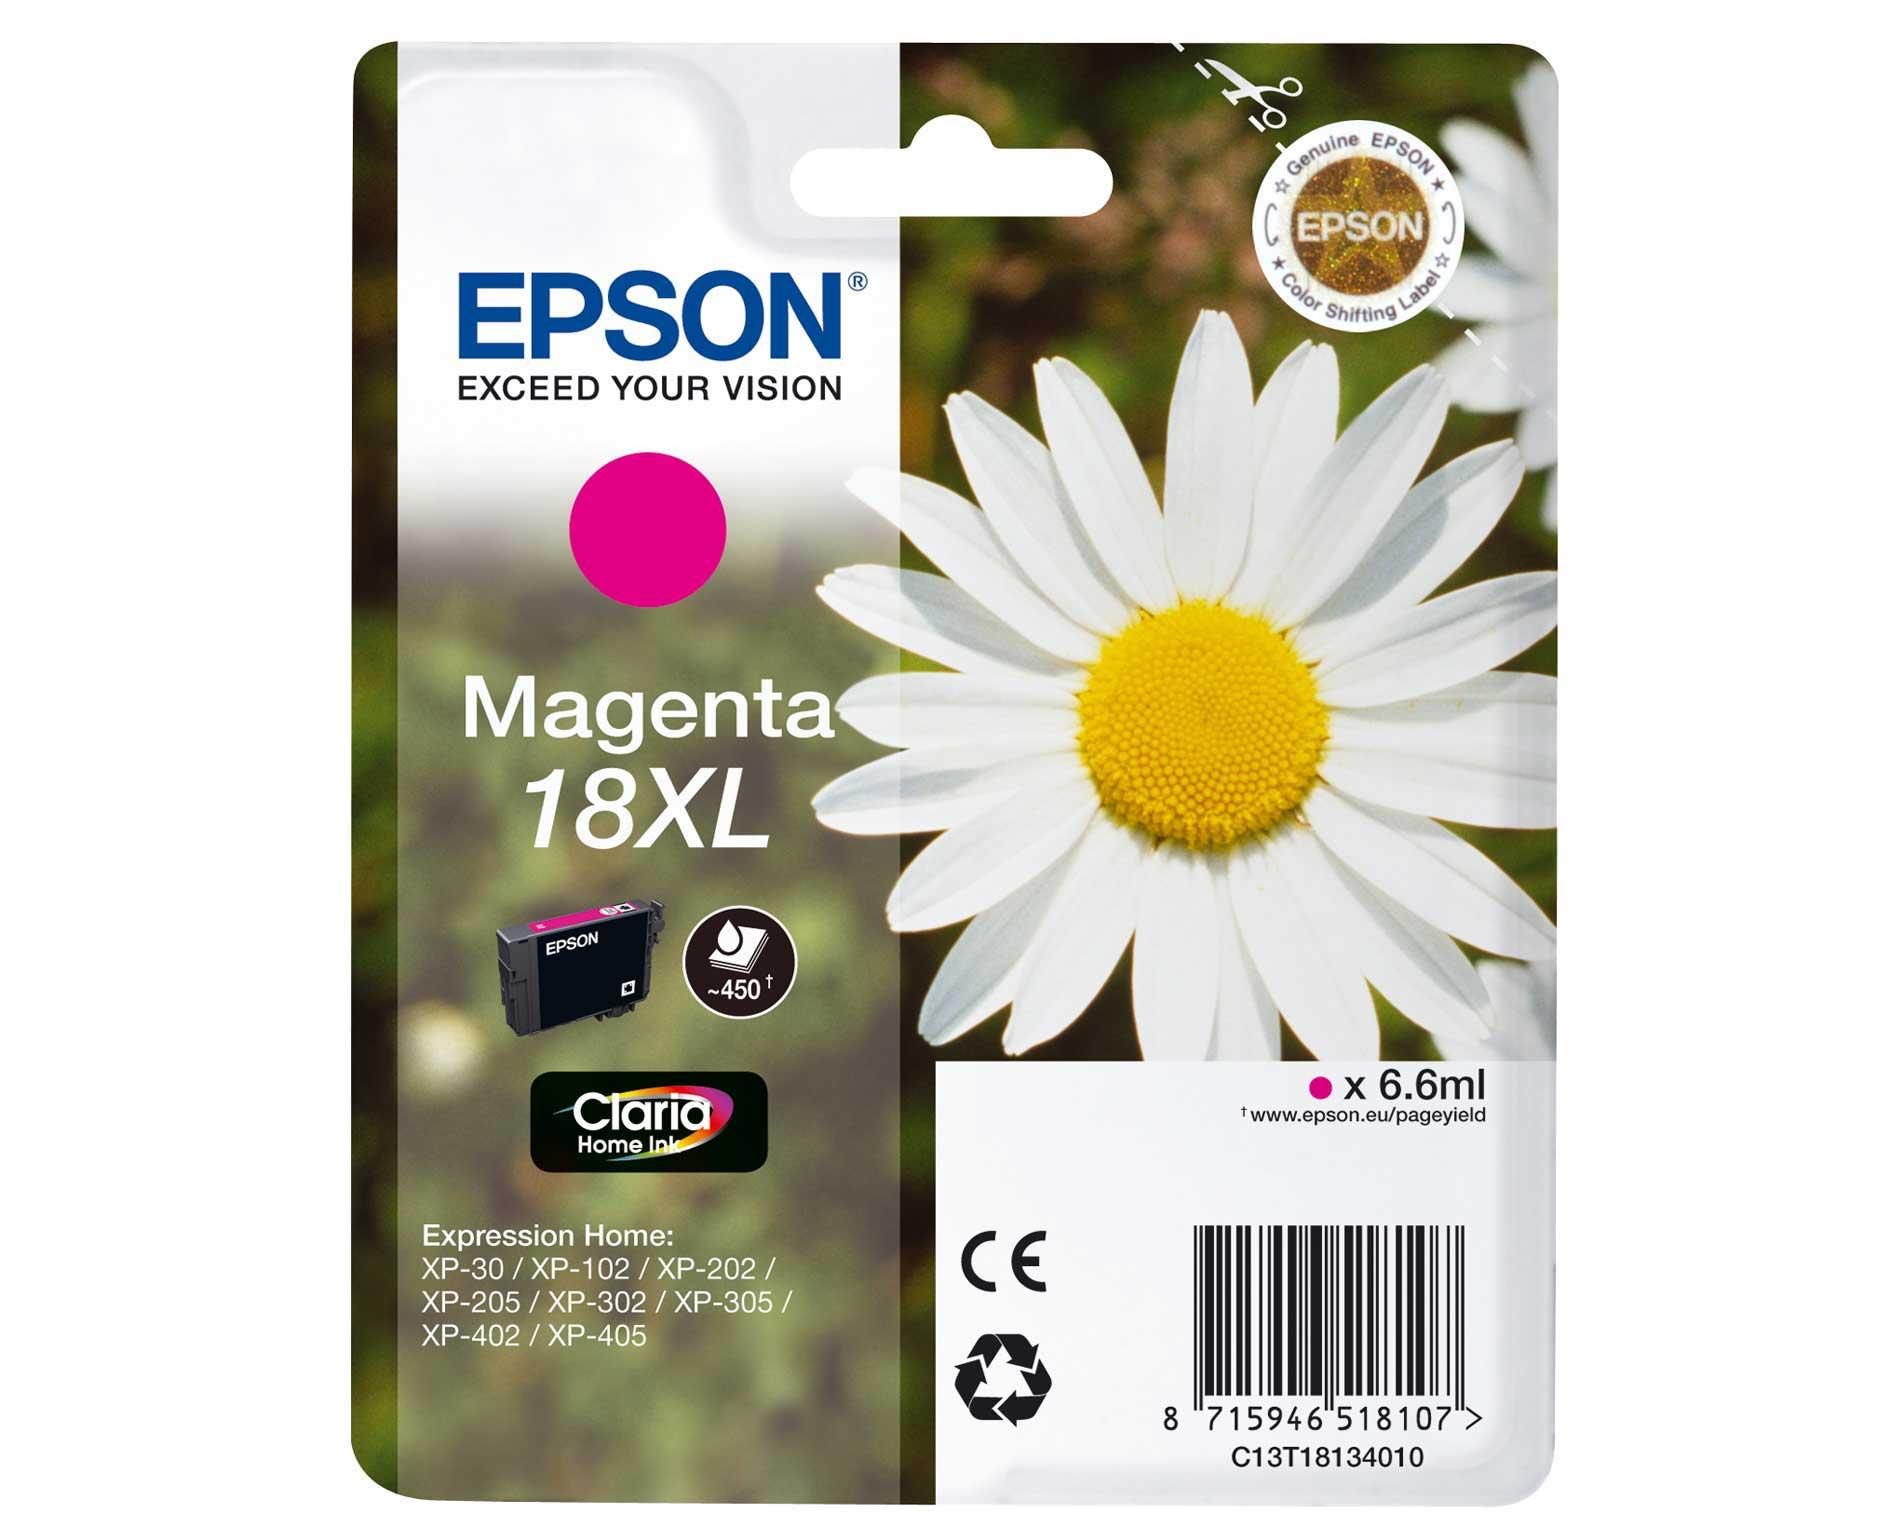 Epson C13T18134010   cartuccia magenta,  durata 450 pagine